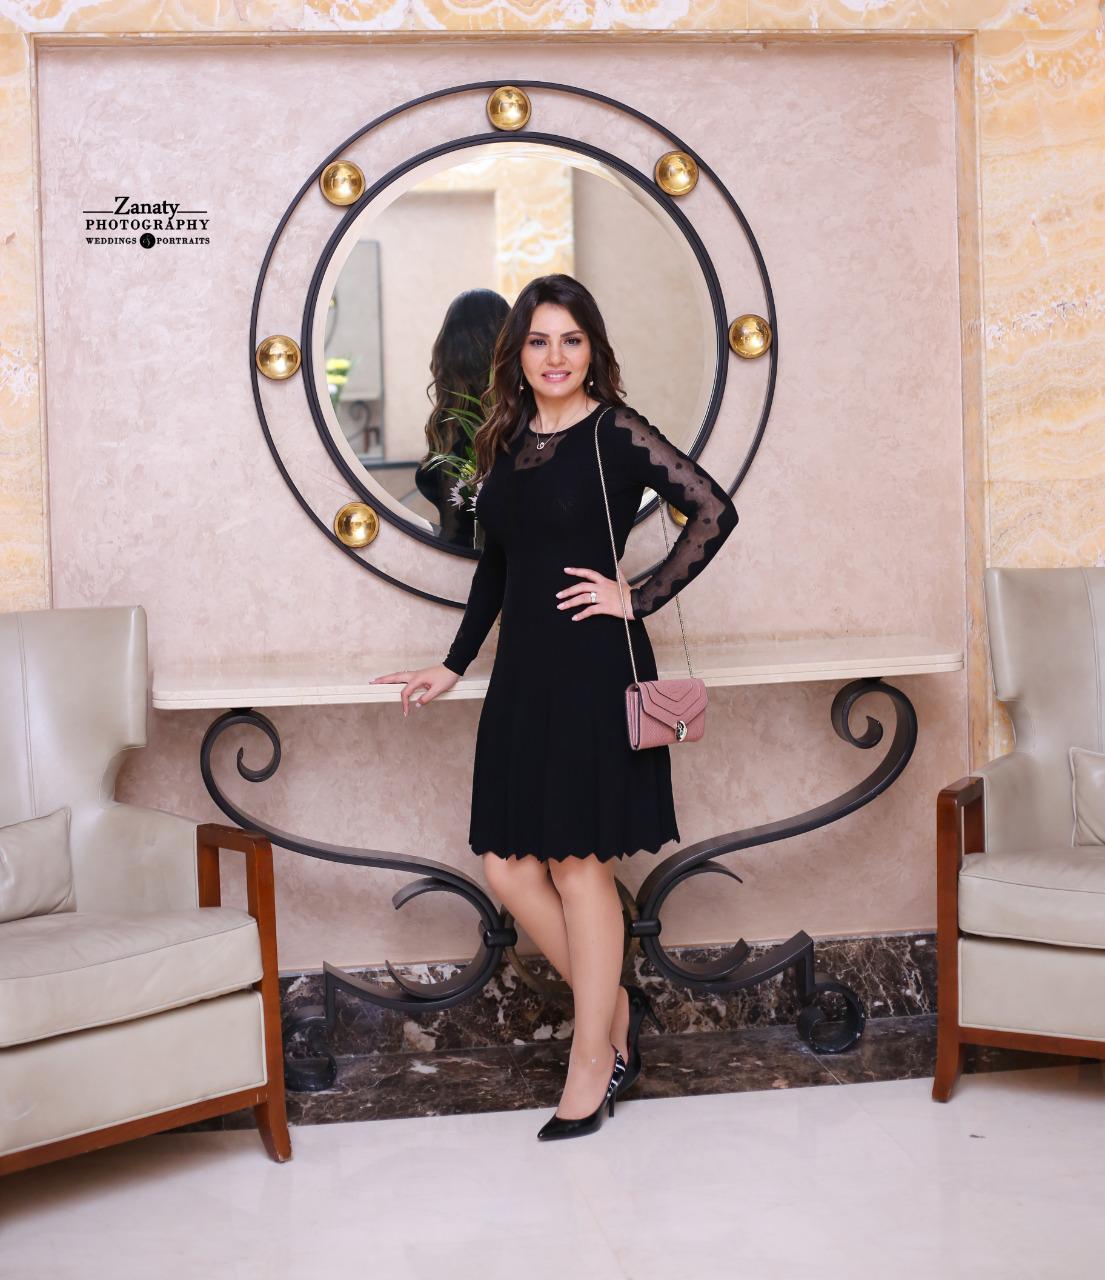 دينا فؤاد (6)